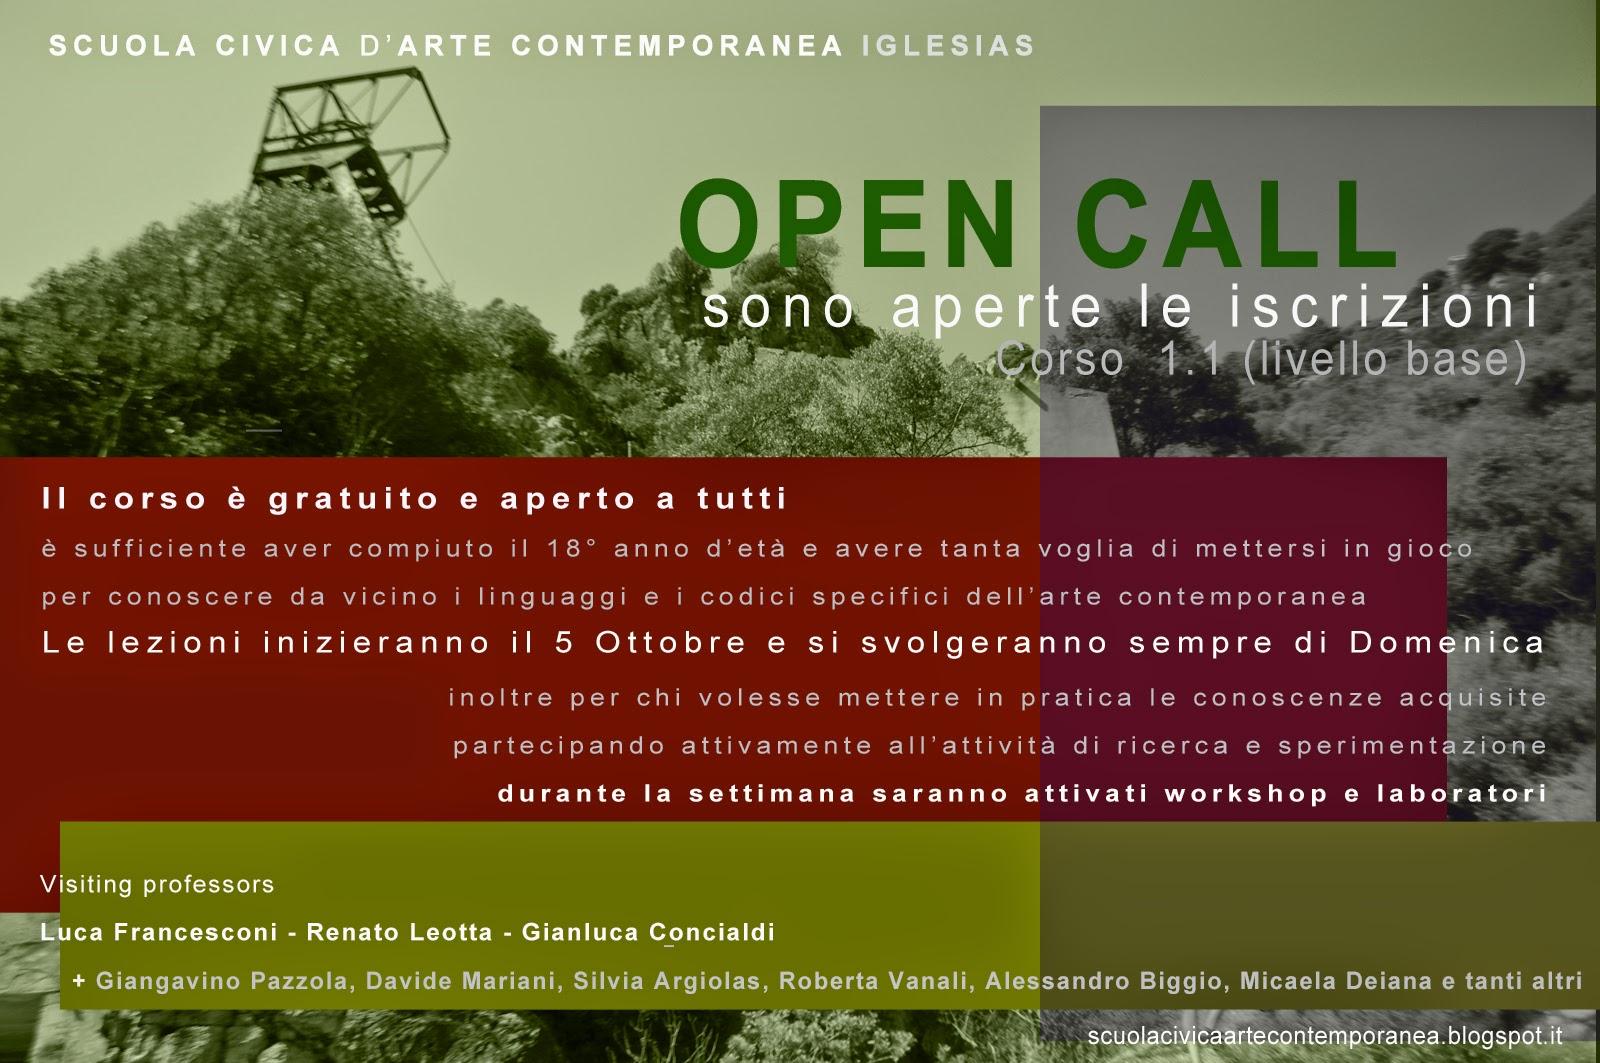 http://scuolacivicaartecontemporanea.blogspot.it/p/blog-page_8513.html